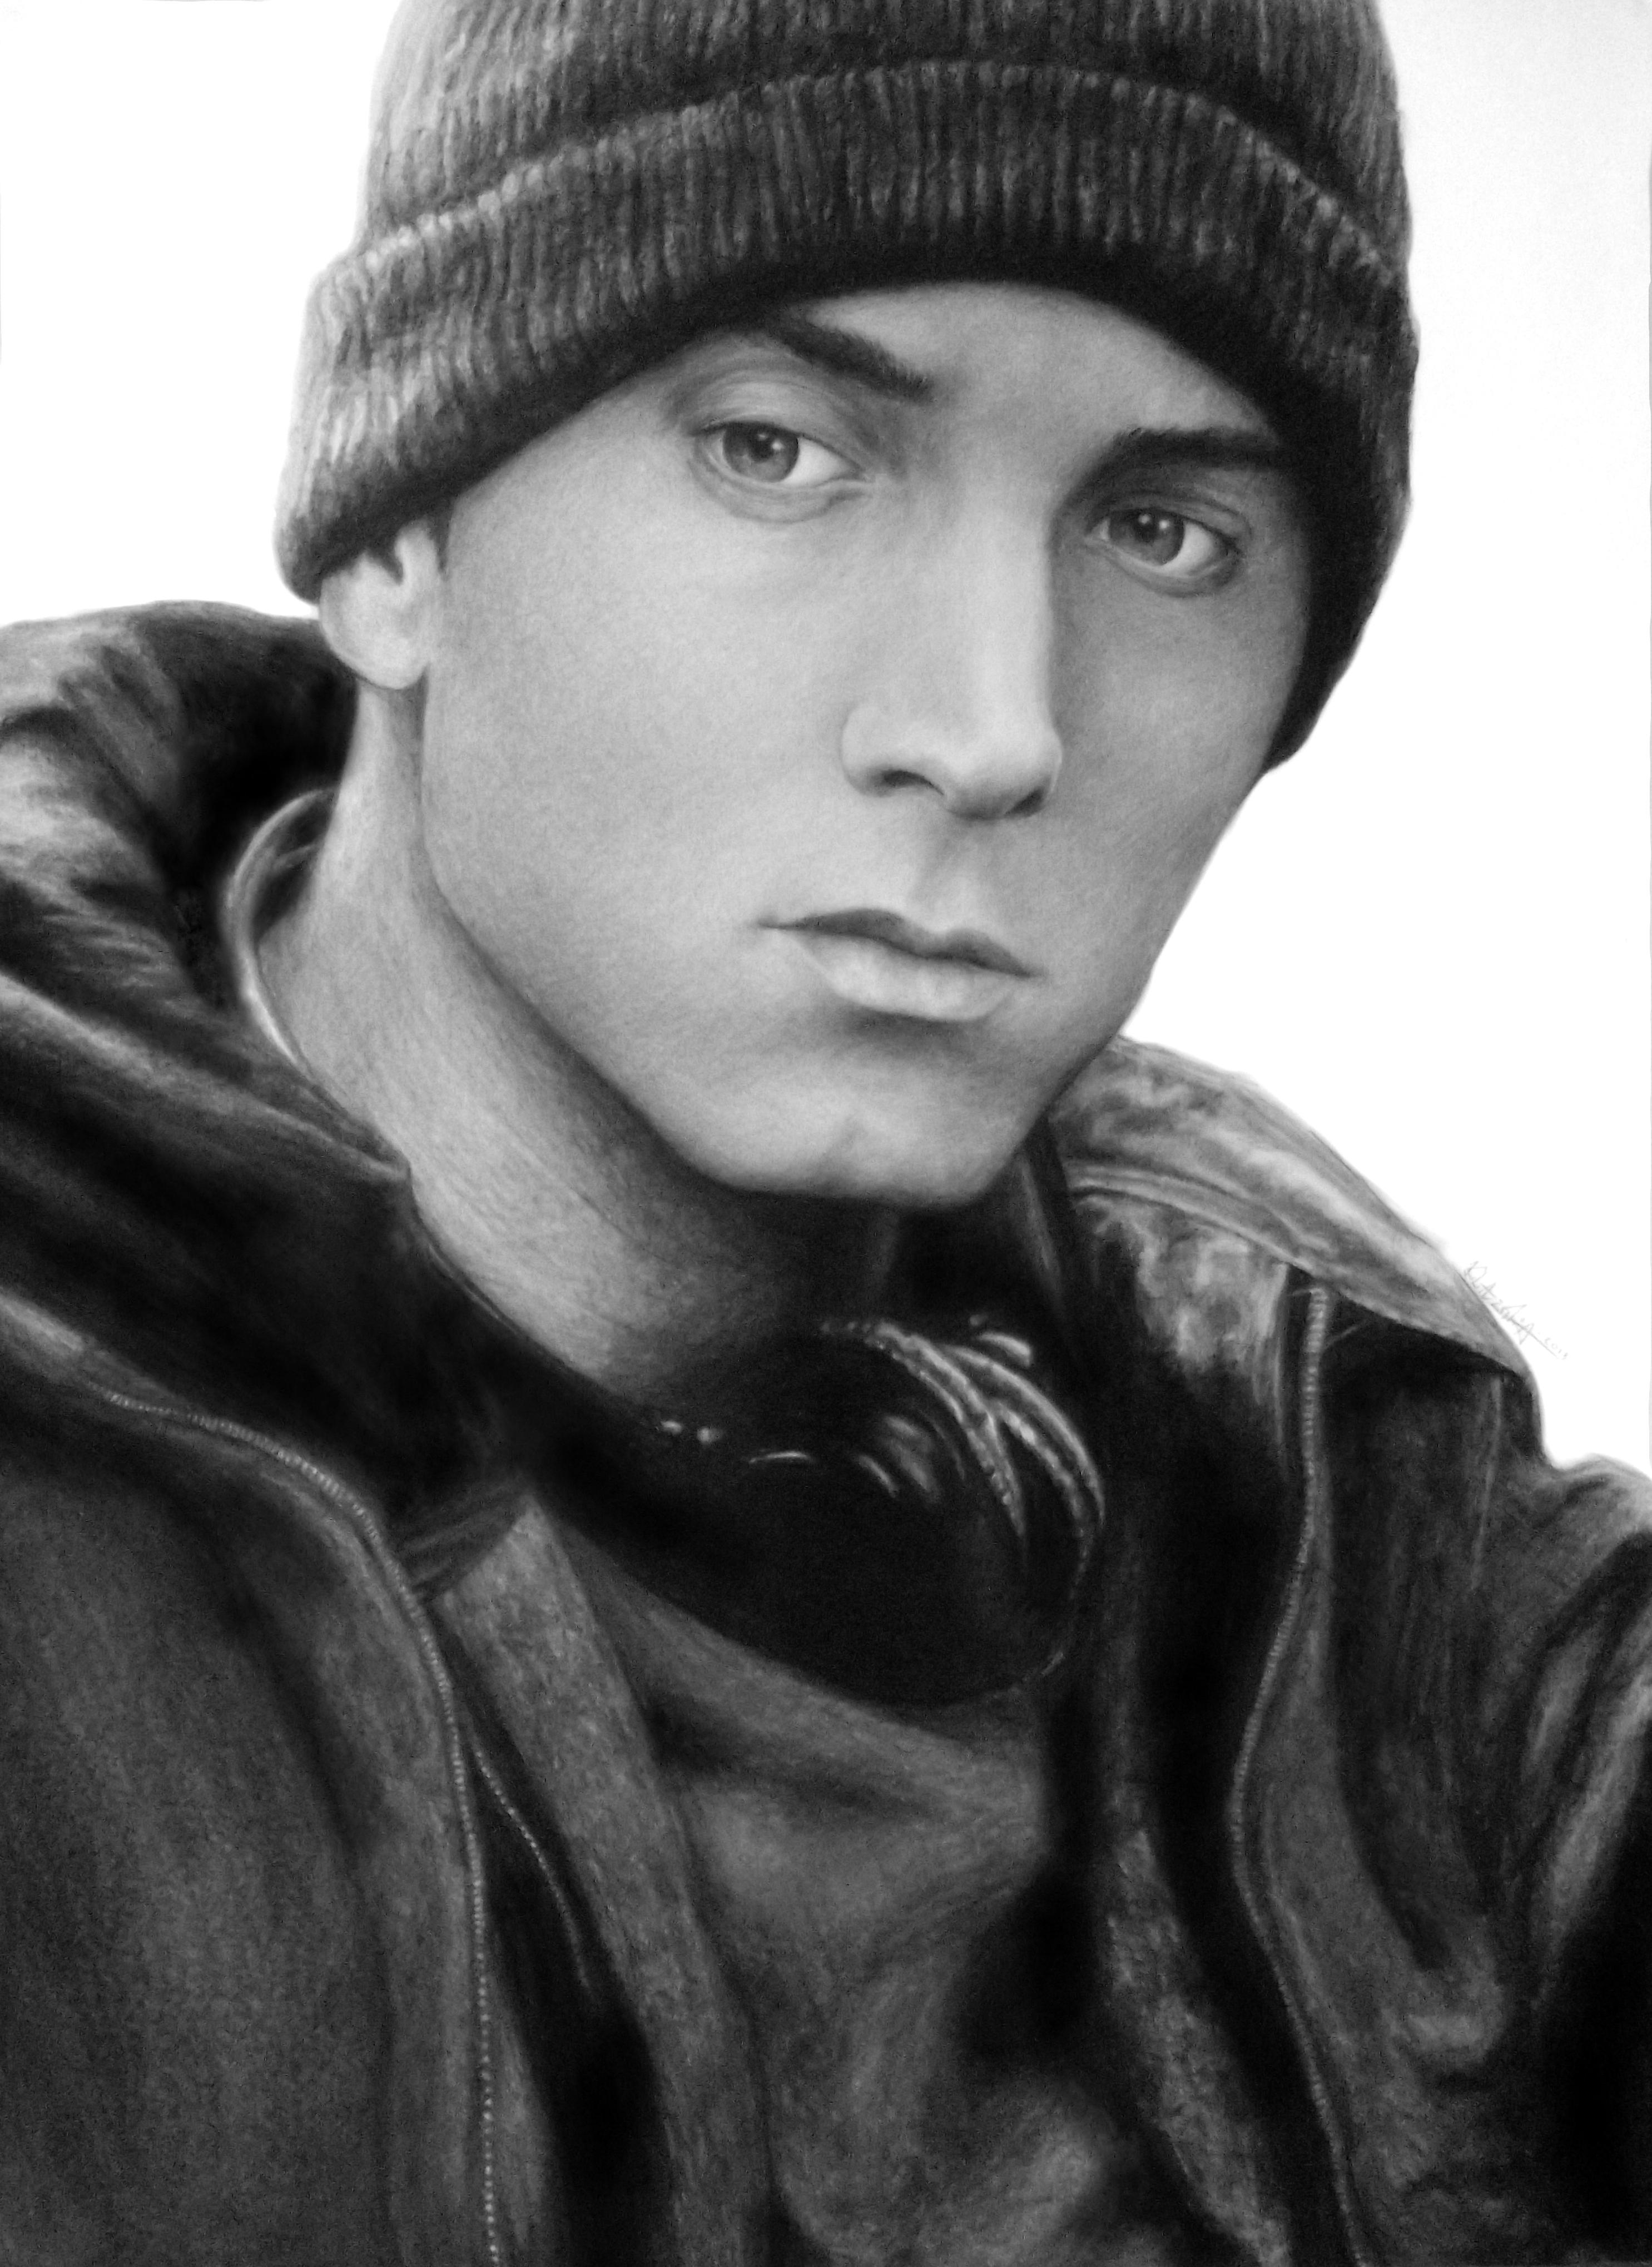 Eminem by ciapsson on DeviantArt